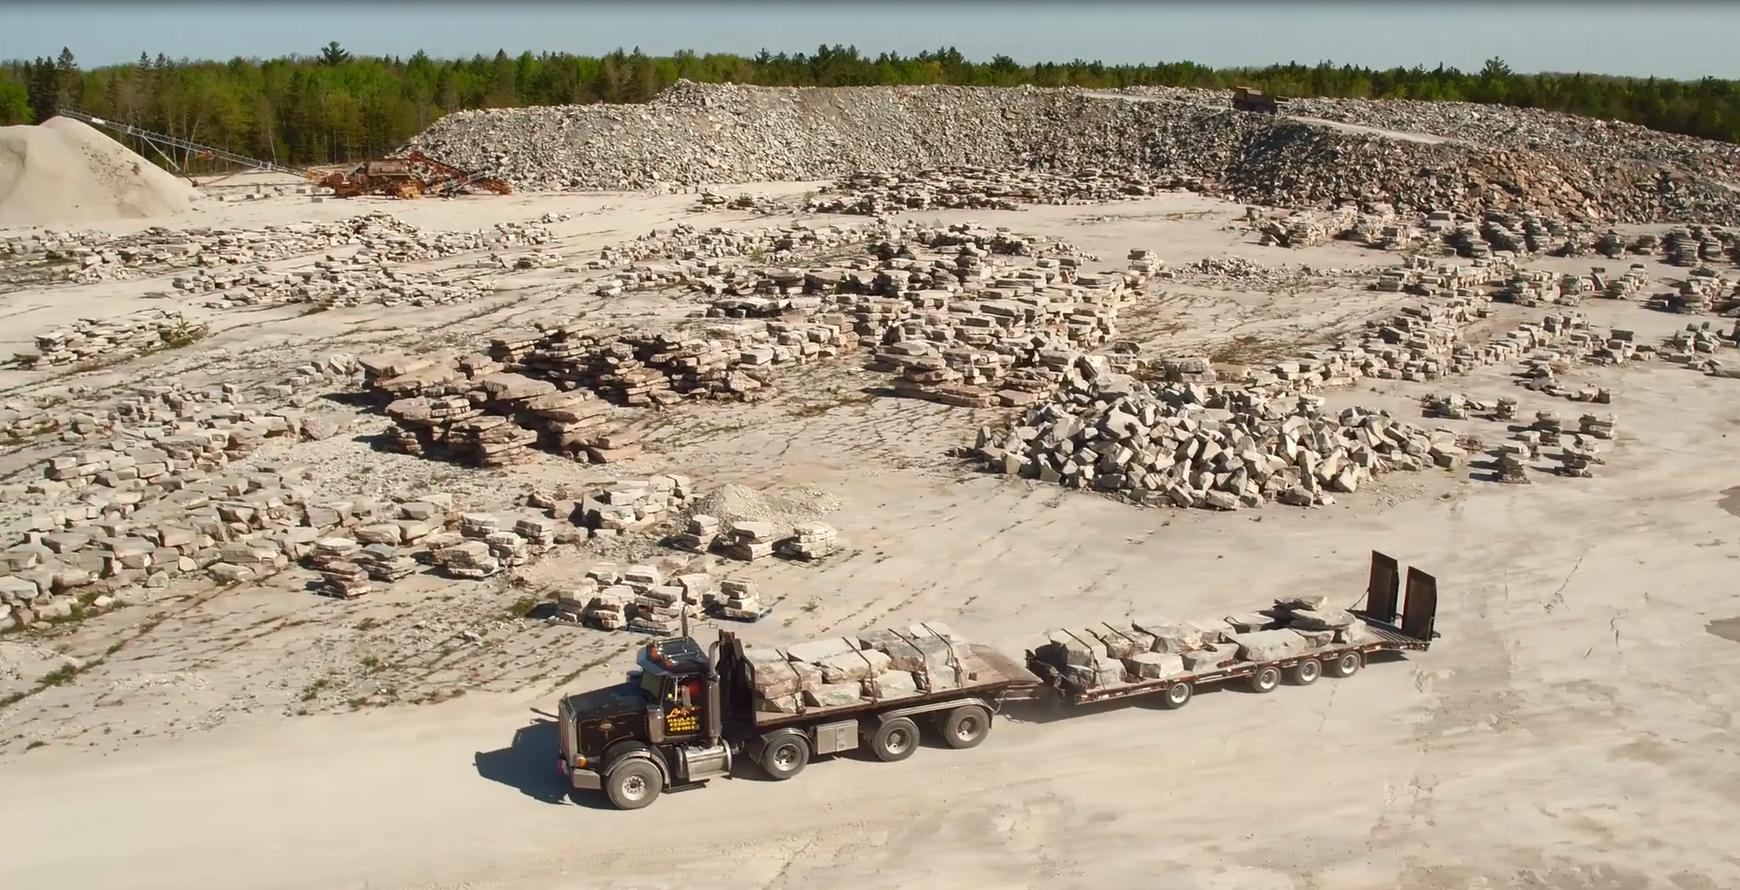 Photo of allstone quarry taken from birds eye view